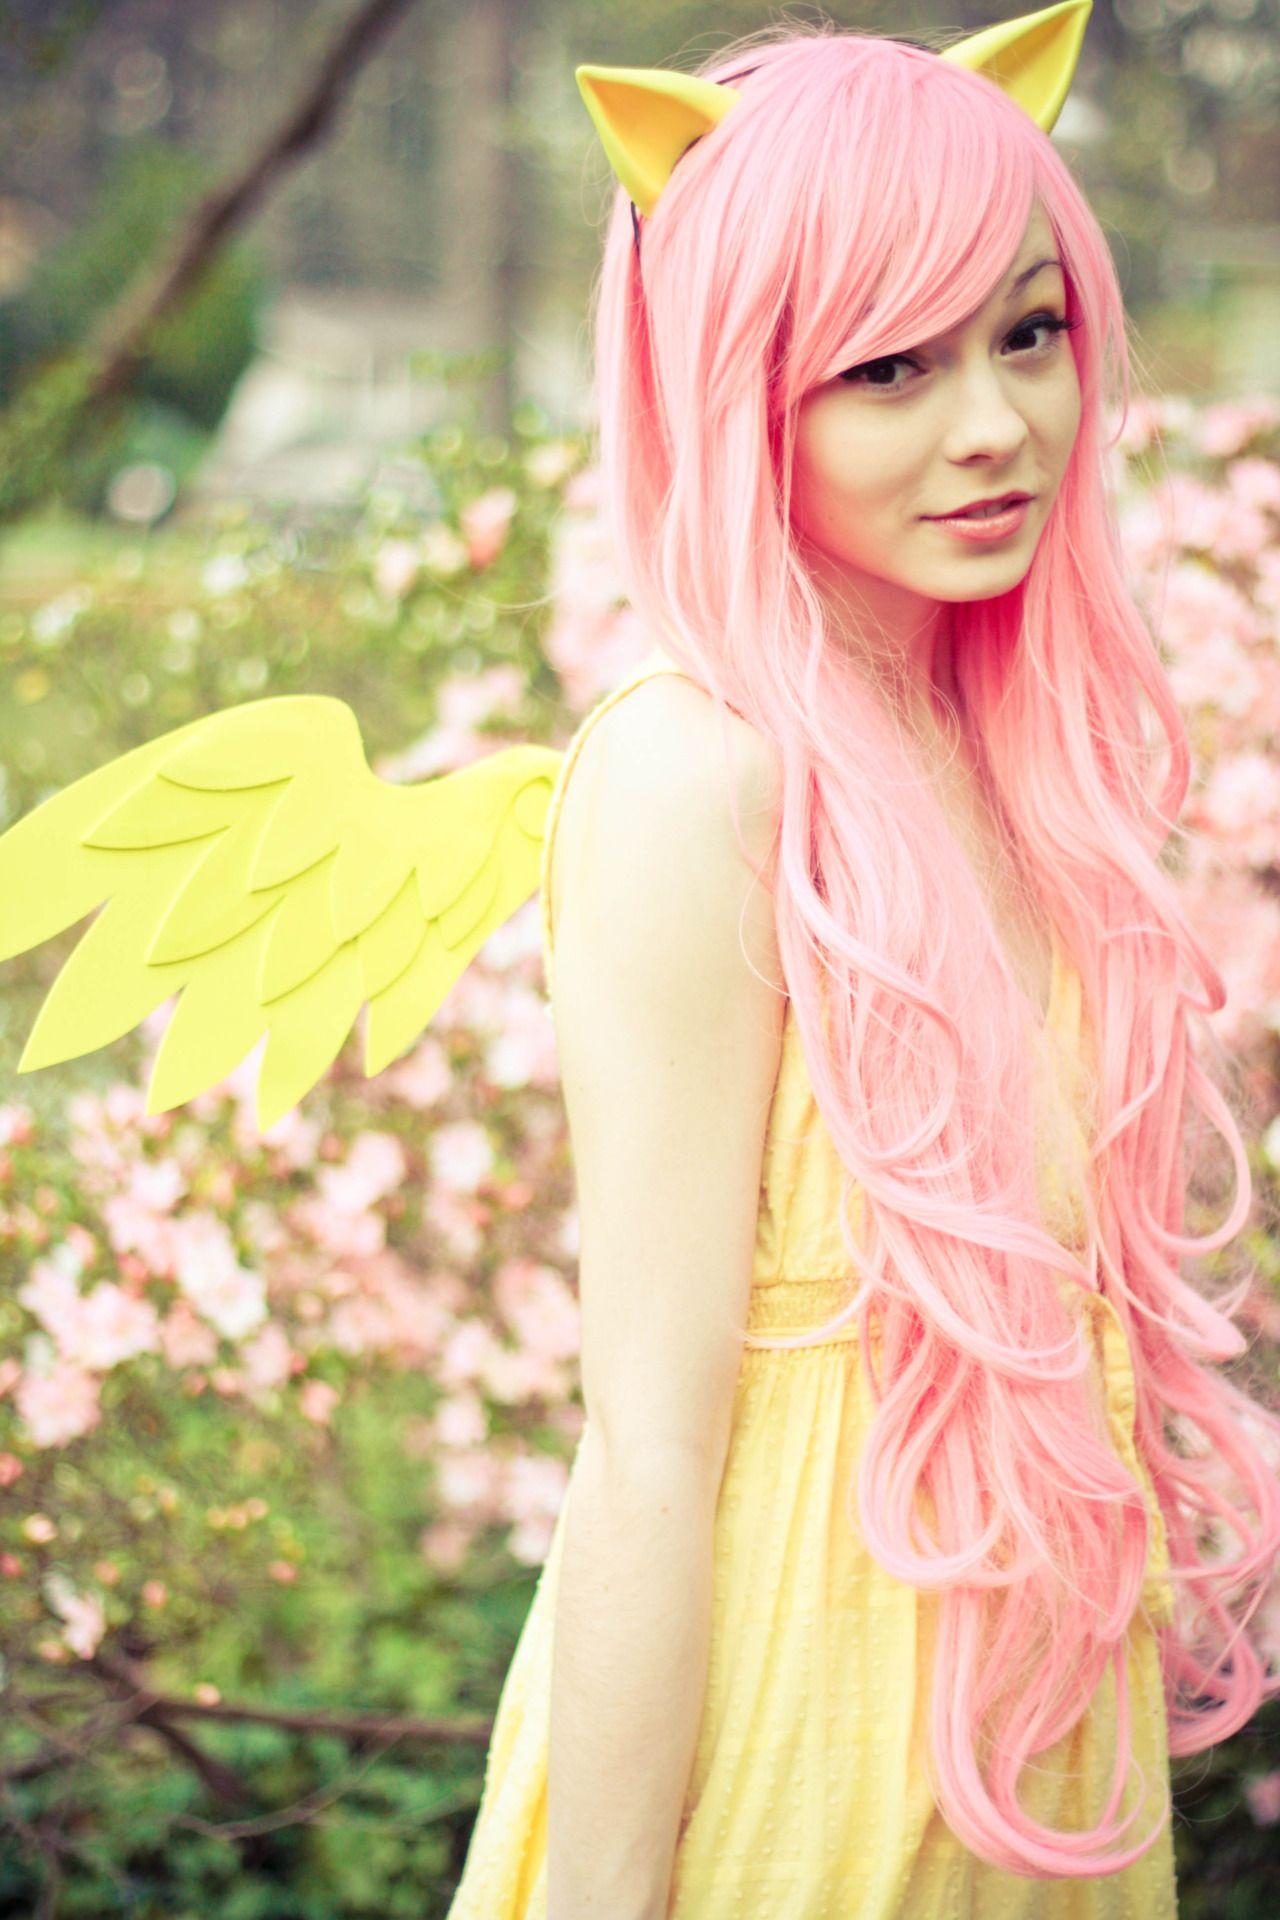 best hair i've seen on a fluttershy | halloween/cosplay | pinterest